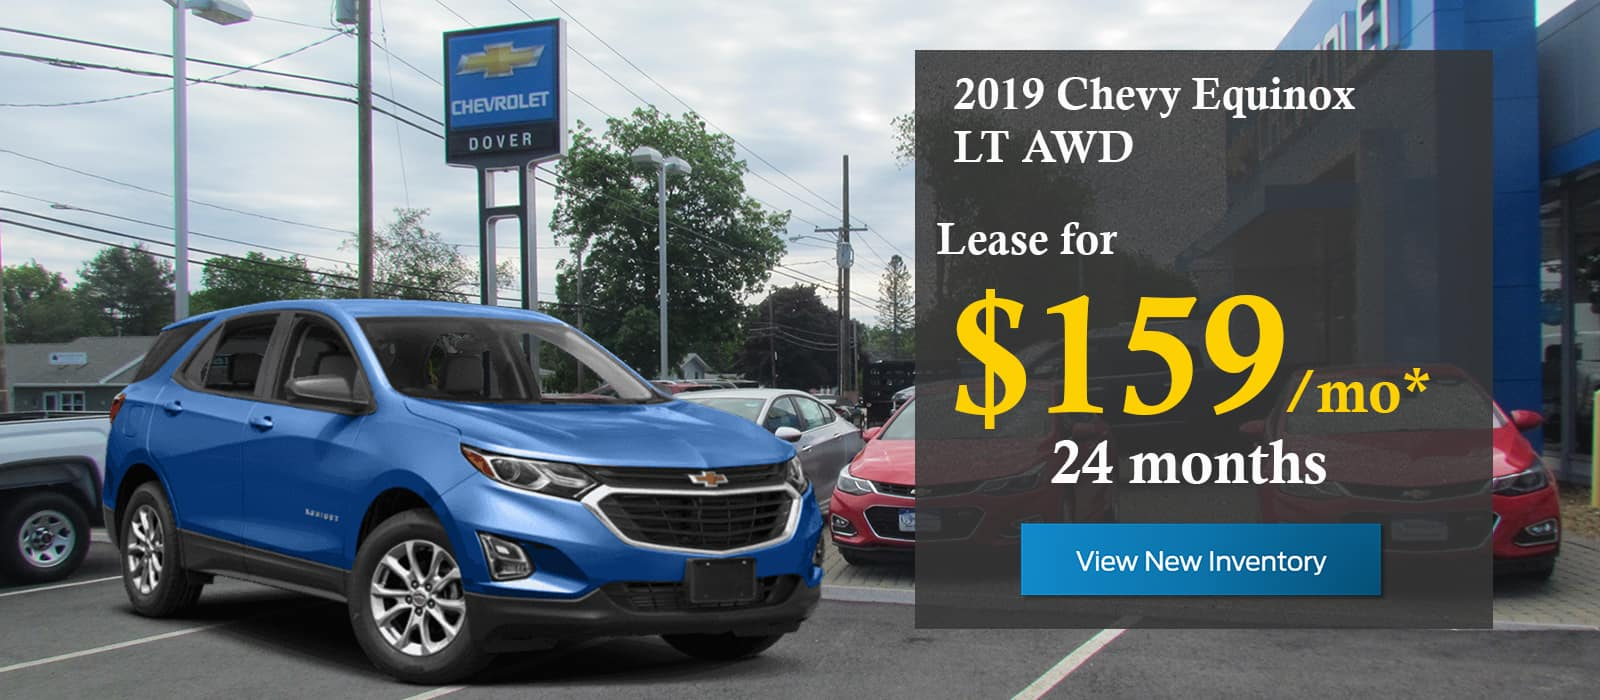 Chevrolet Of Dover >> Dover Chevrolet Chevrolet Dealer In Dover Nh